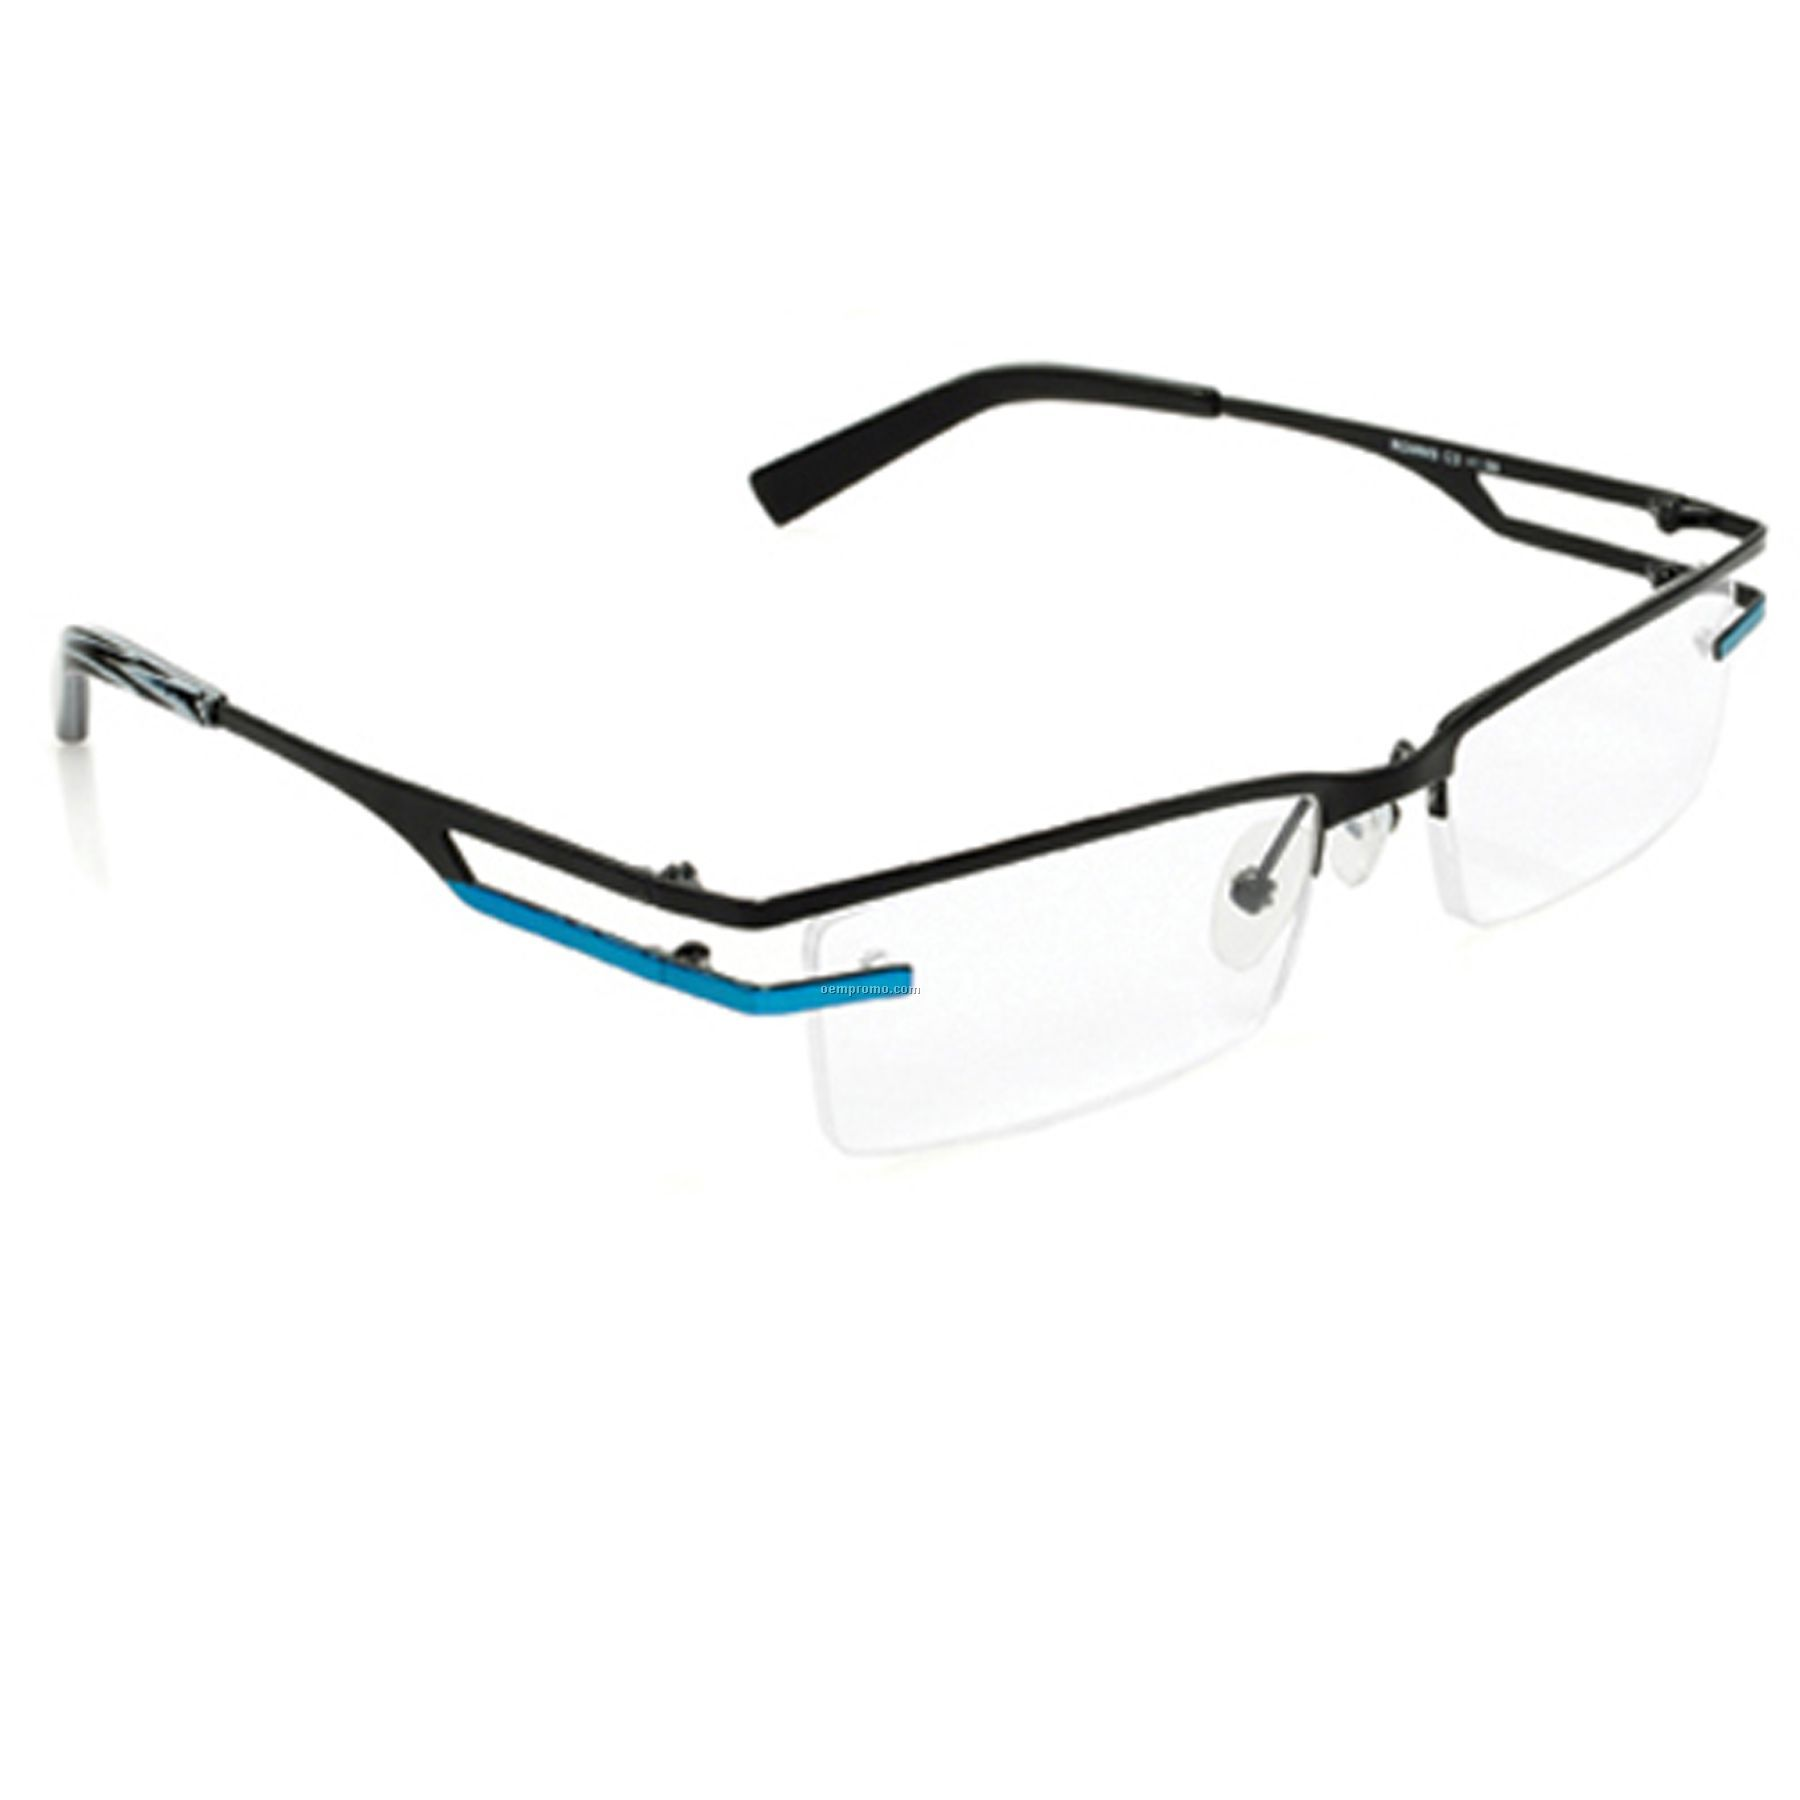 Frameless Glasses Lenscrafters : CLEAR RIMLESS EYEGLASSES Glass Eyes Online